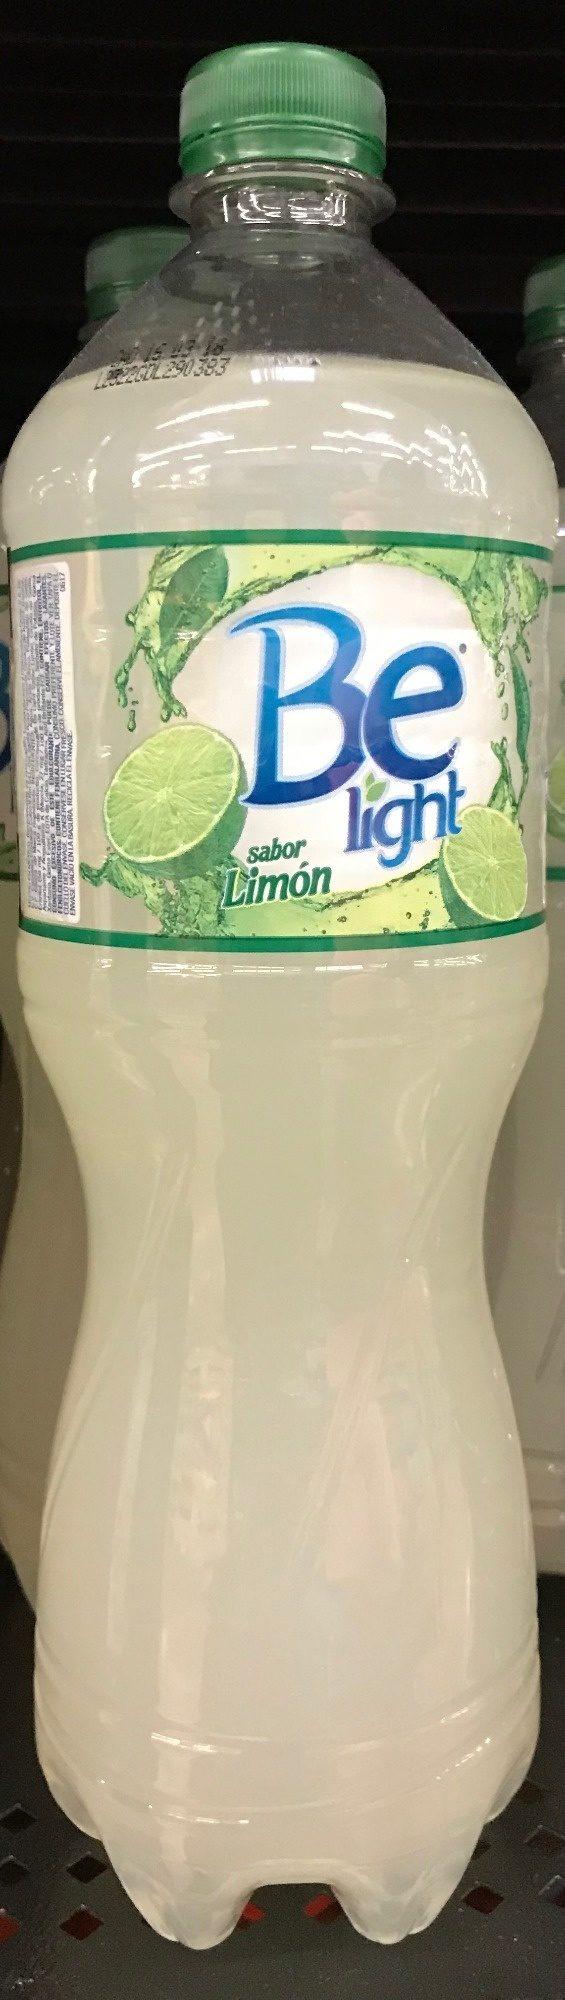 Belight Limón - Product - es